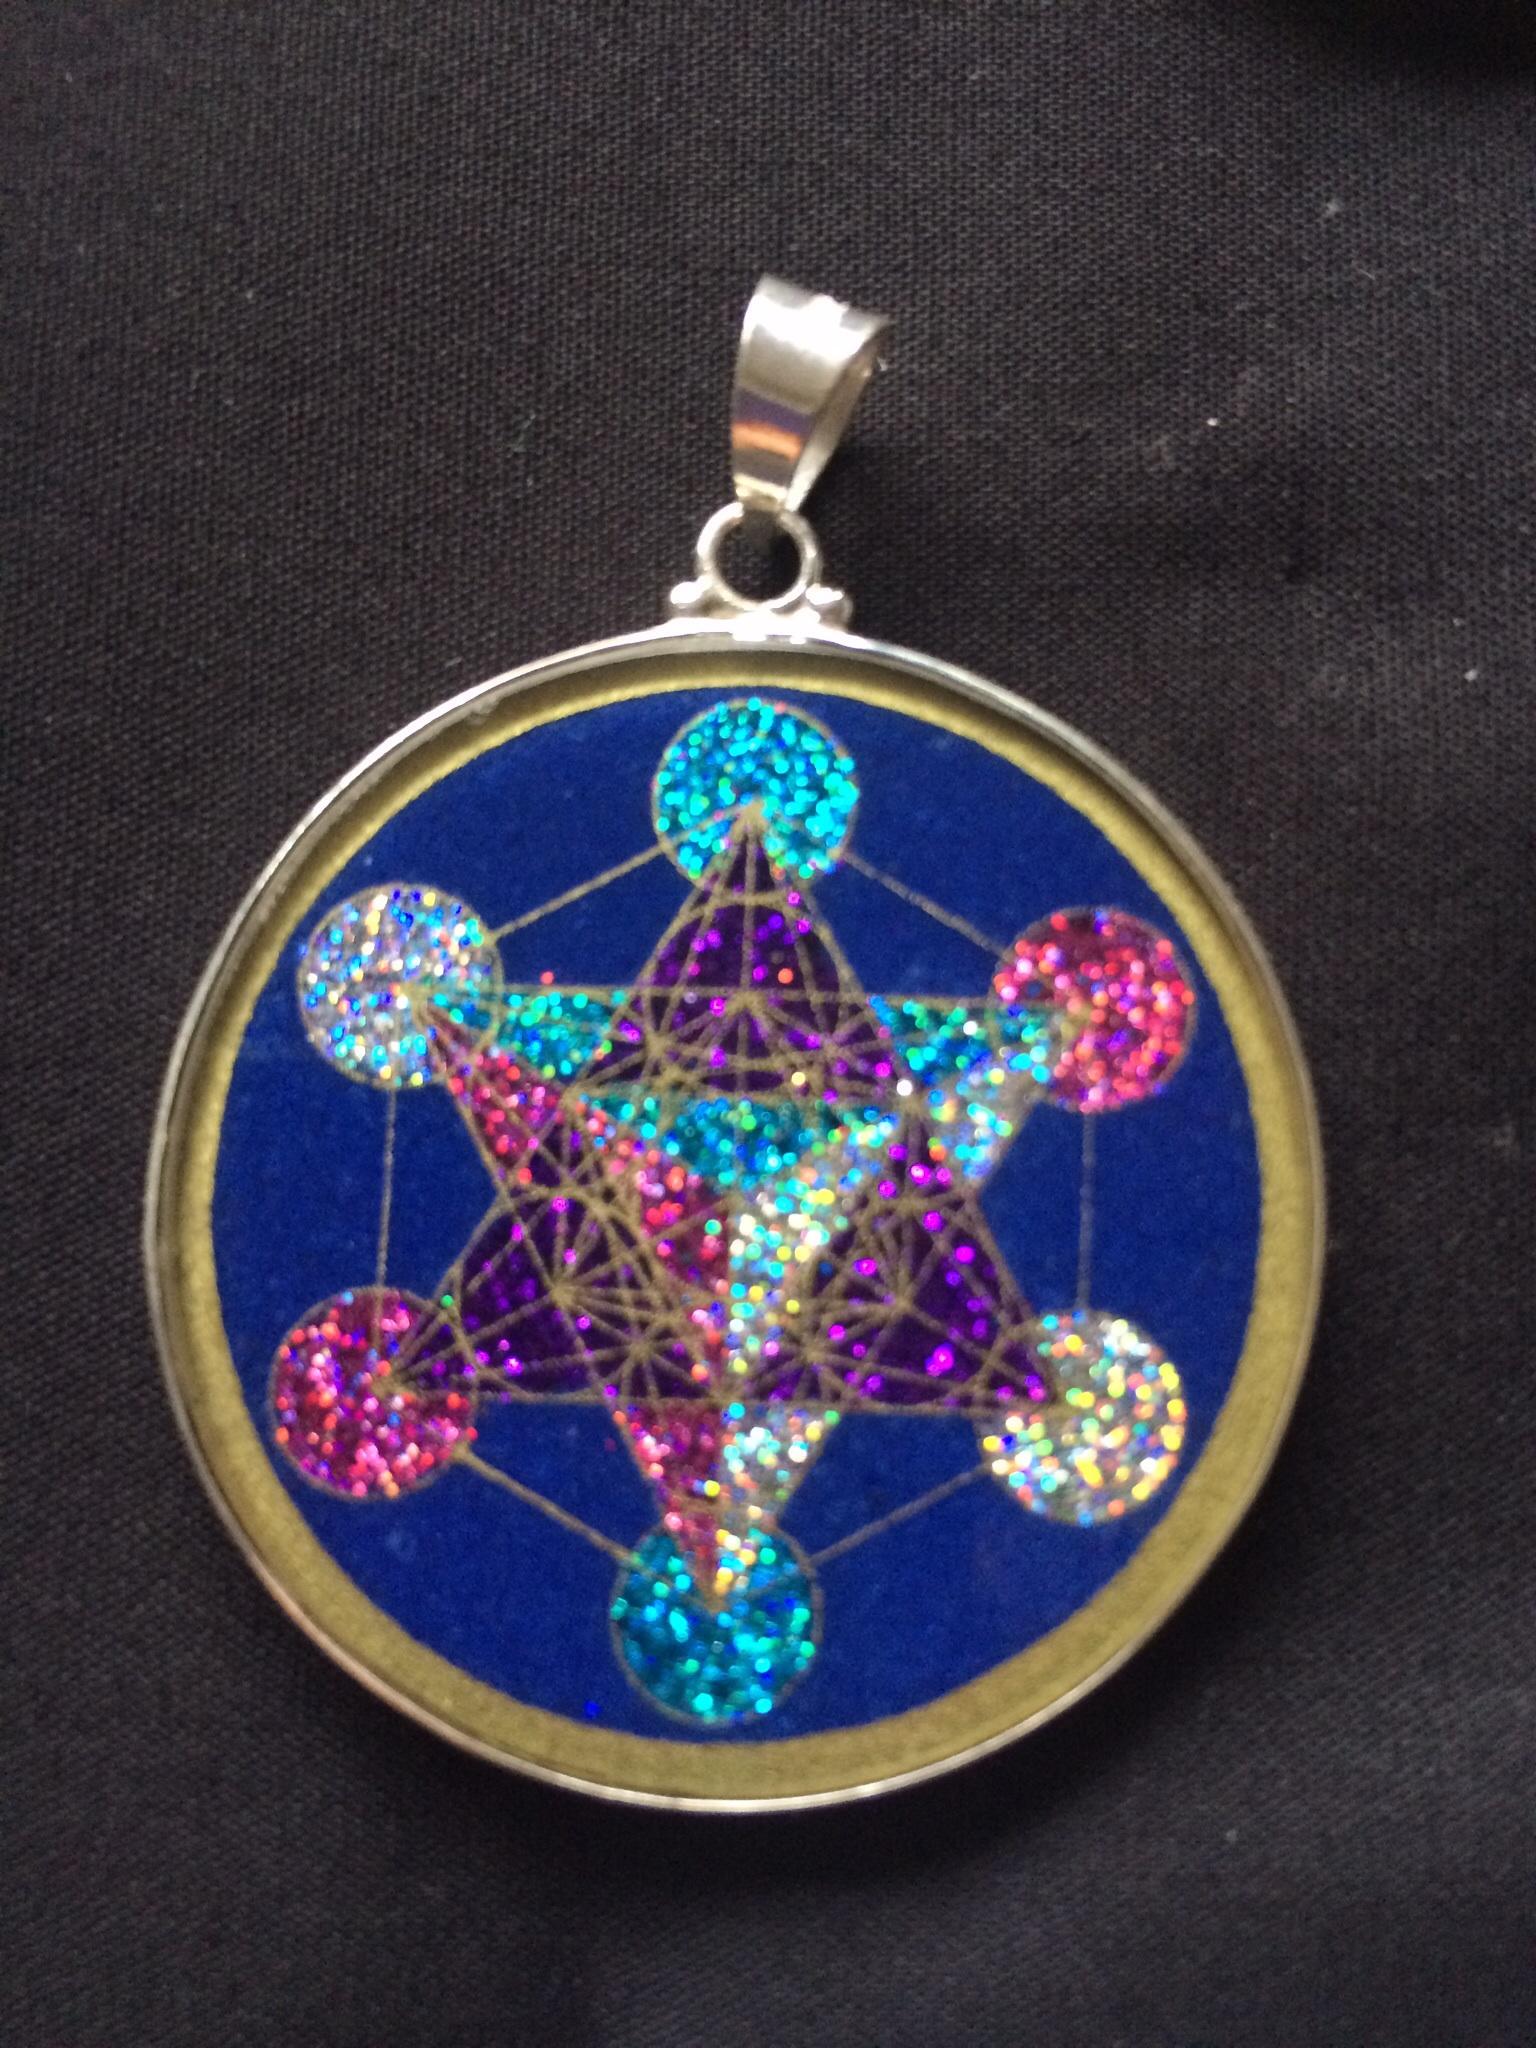 Metatron 39 s cube pendant rainbows of healing boutique for Metatron s cube jewelry